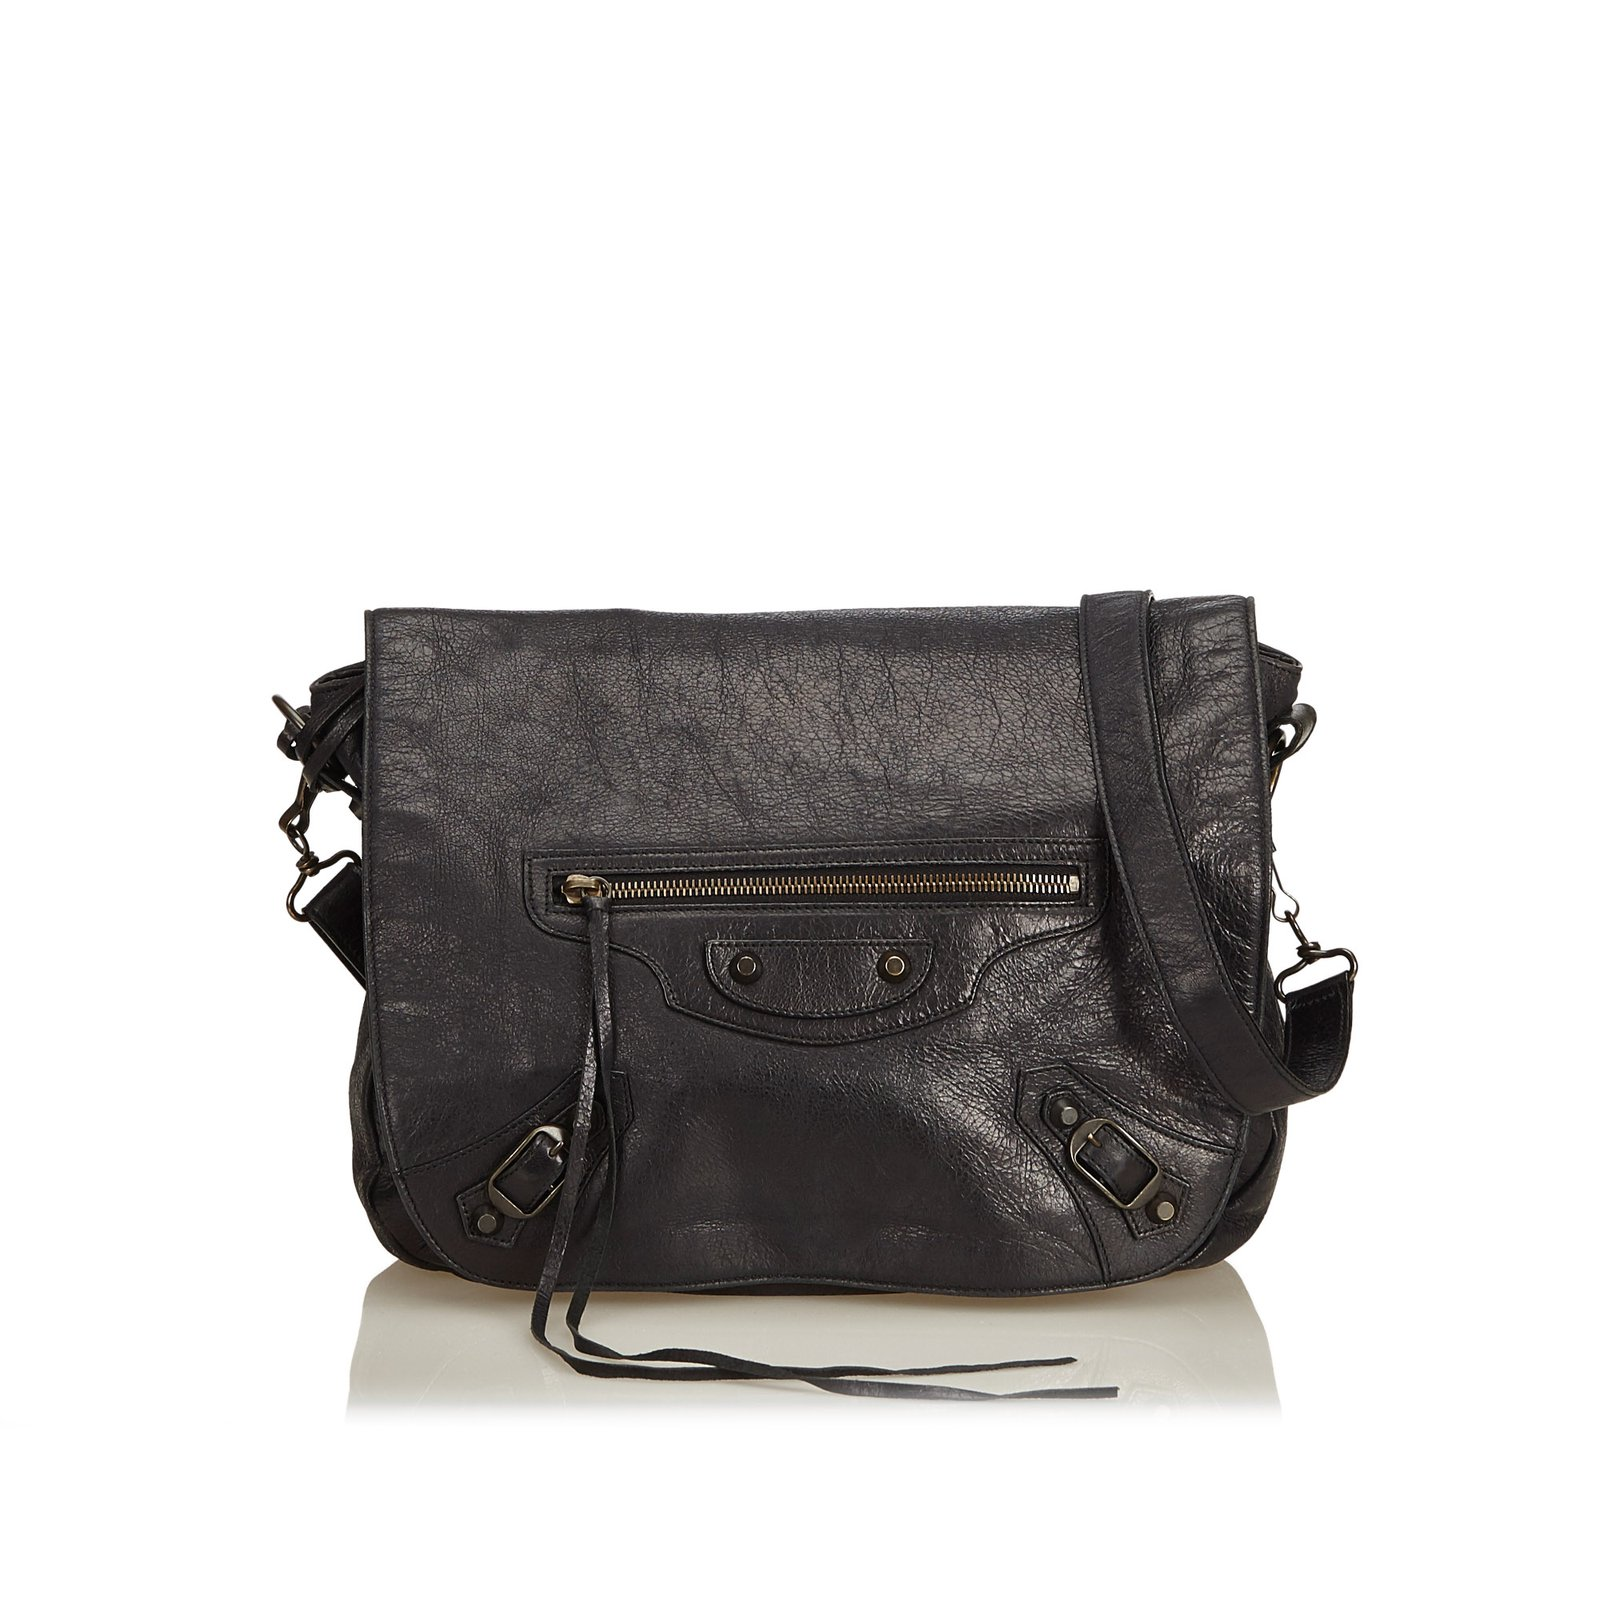 ee68f79193b3 Balenciaga Motocross Classic Folk Messenger Bag Handbags Leather ...